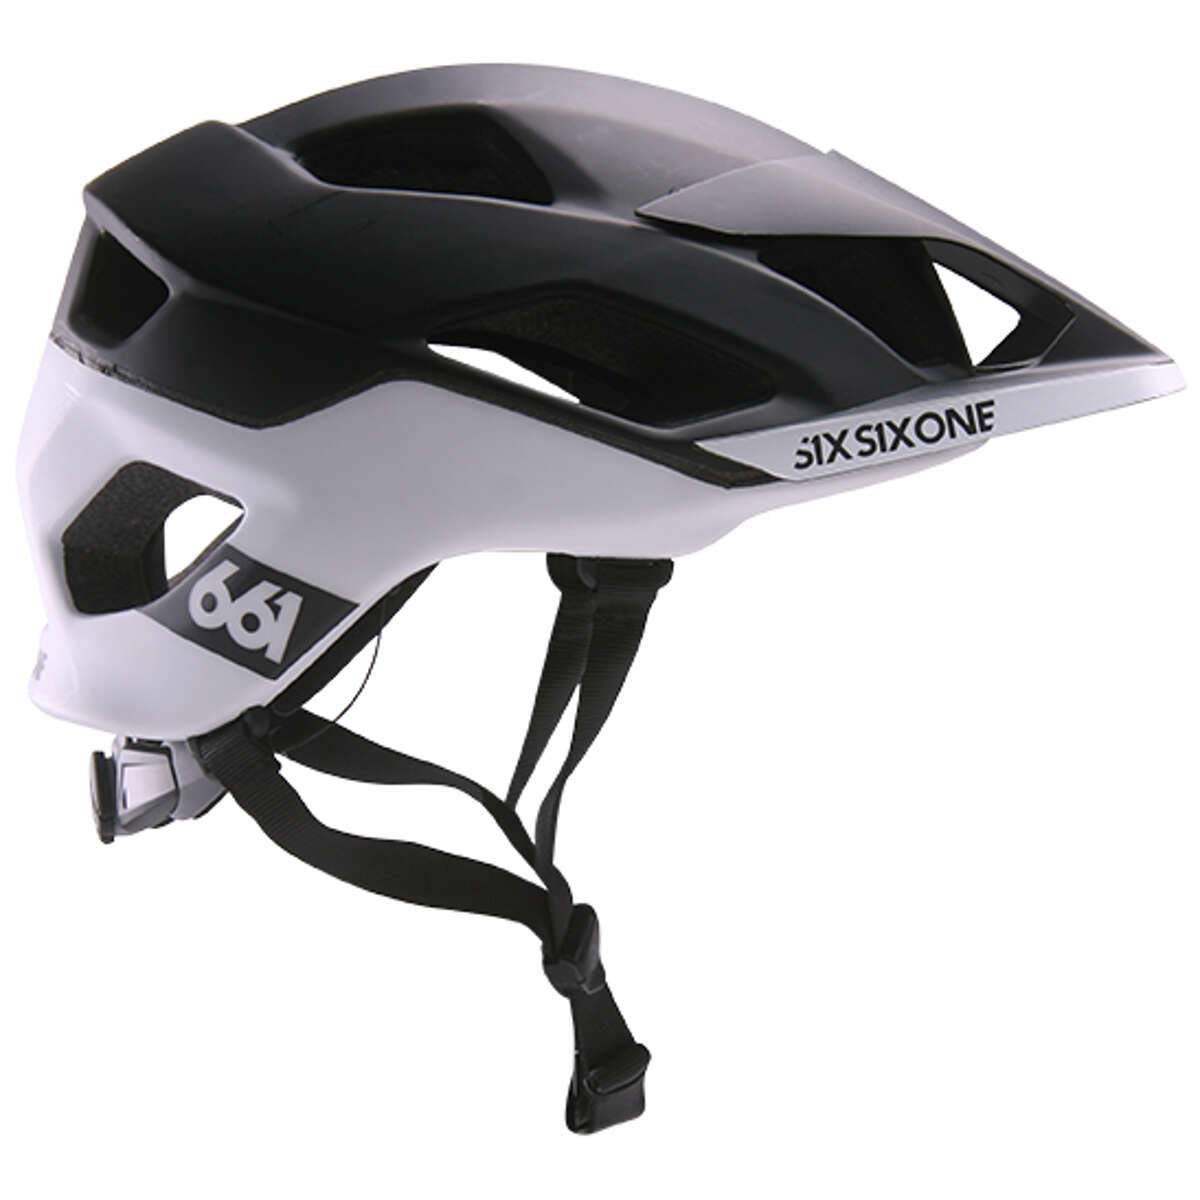 Sixsixone Evo AM Patrol Casco, Black/White, XS de S